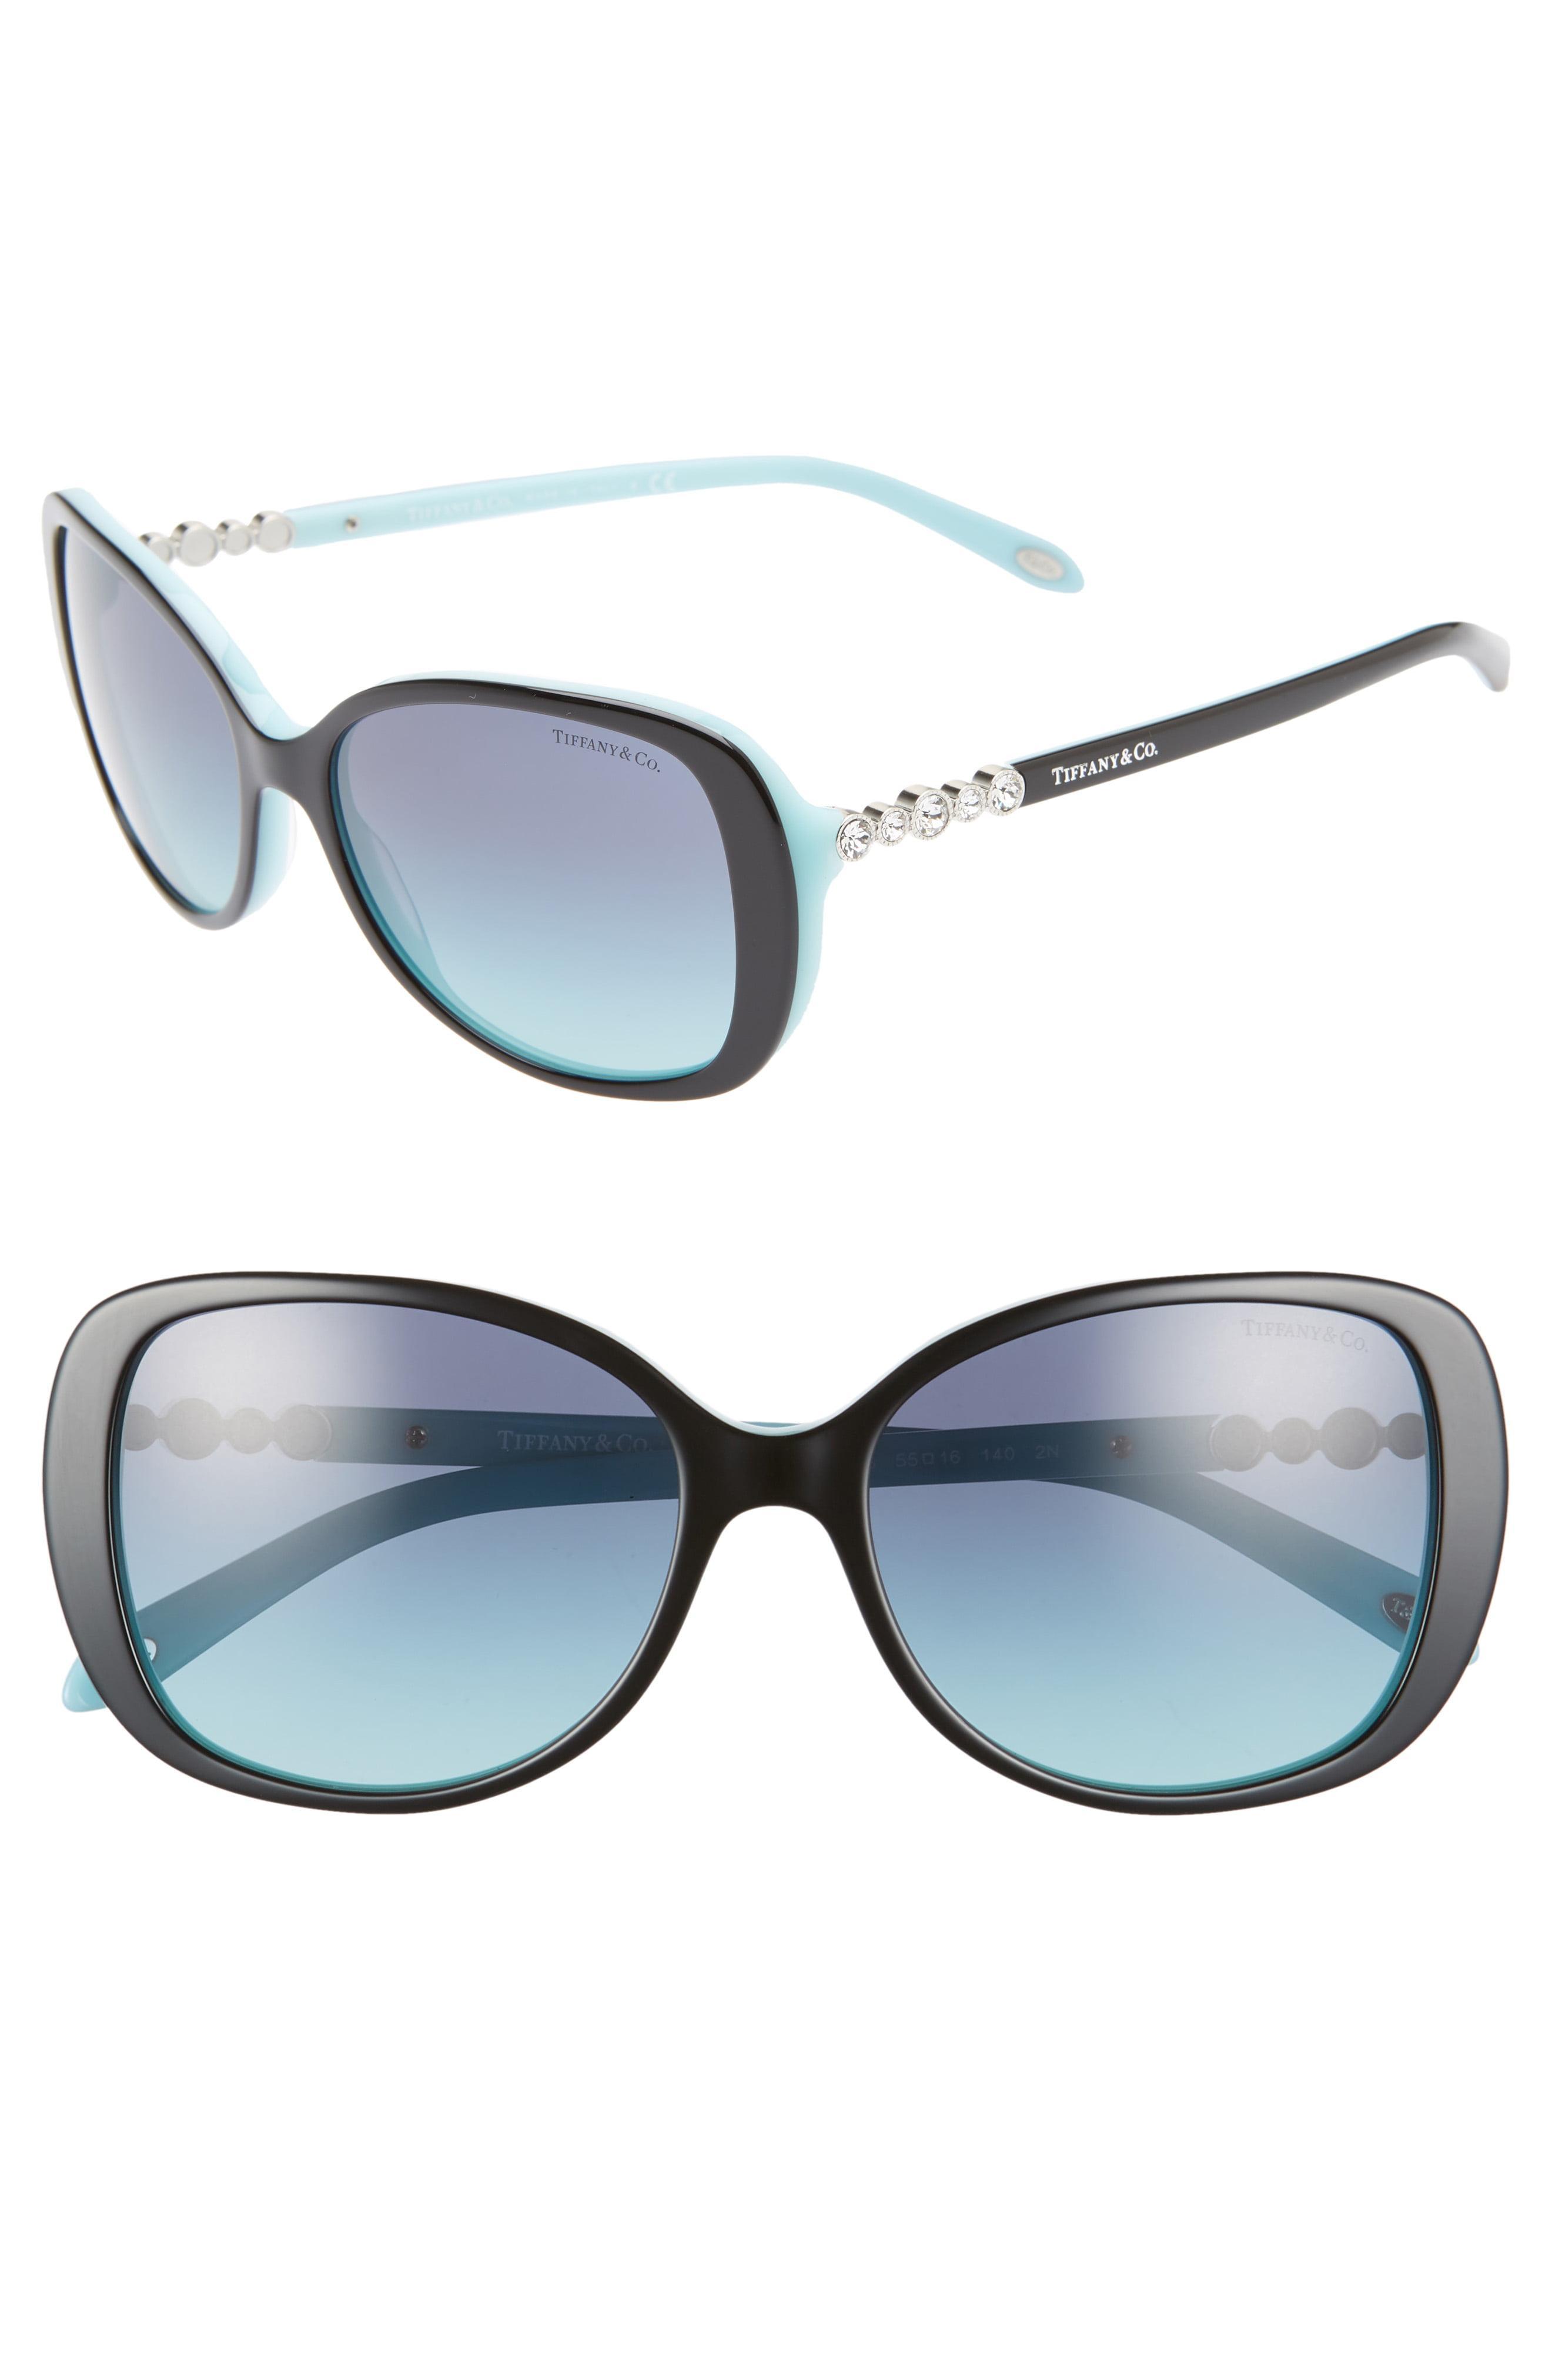 654a0b91b1f Lyst - Tiffany   Co. 55mm Gradient Butterfly Sunglasses in Blue